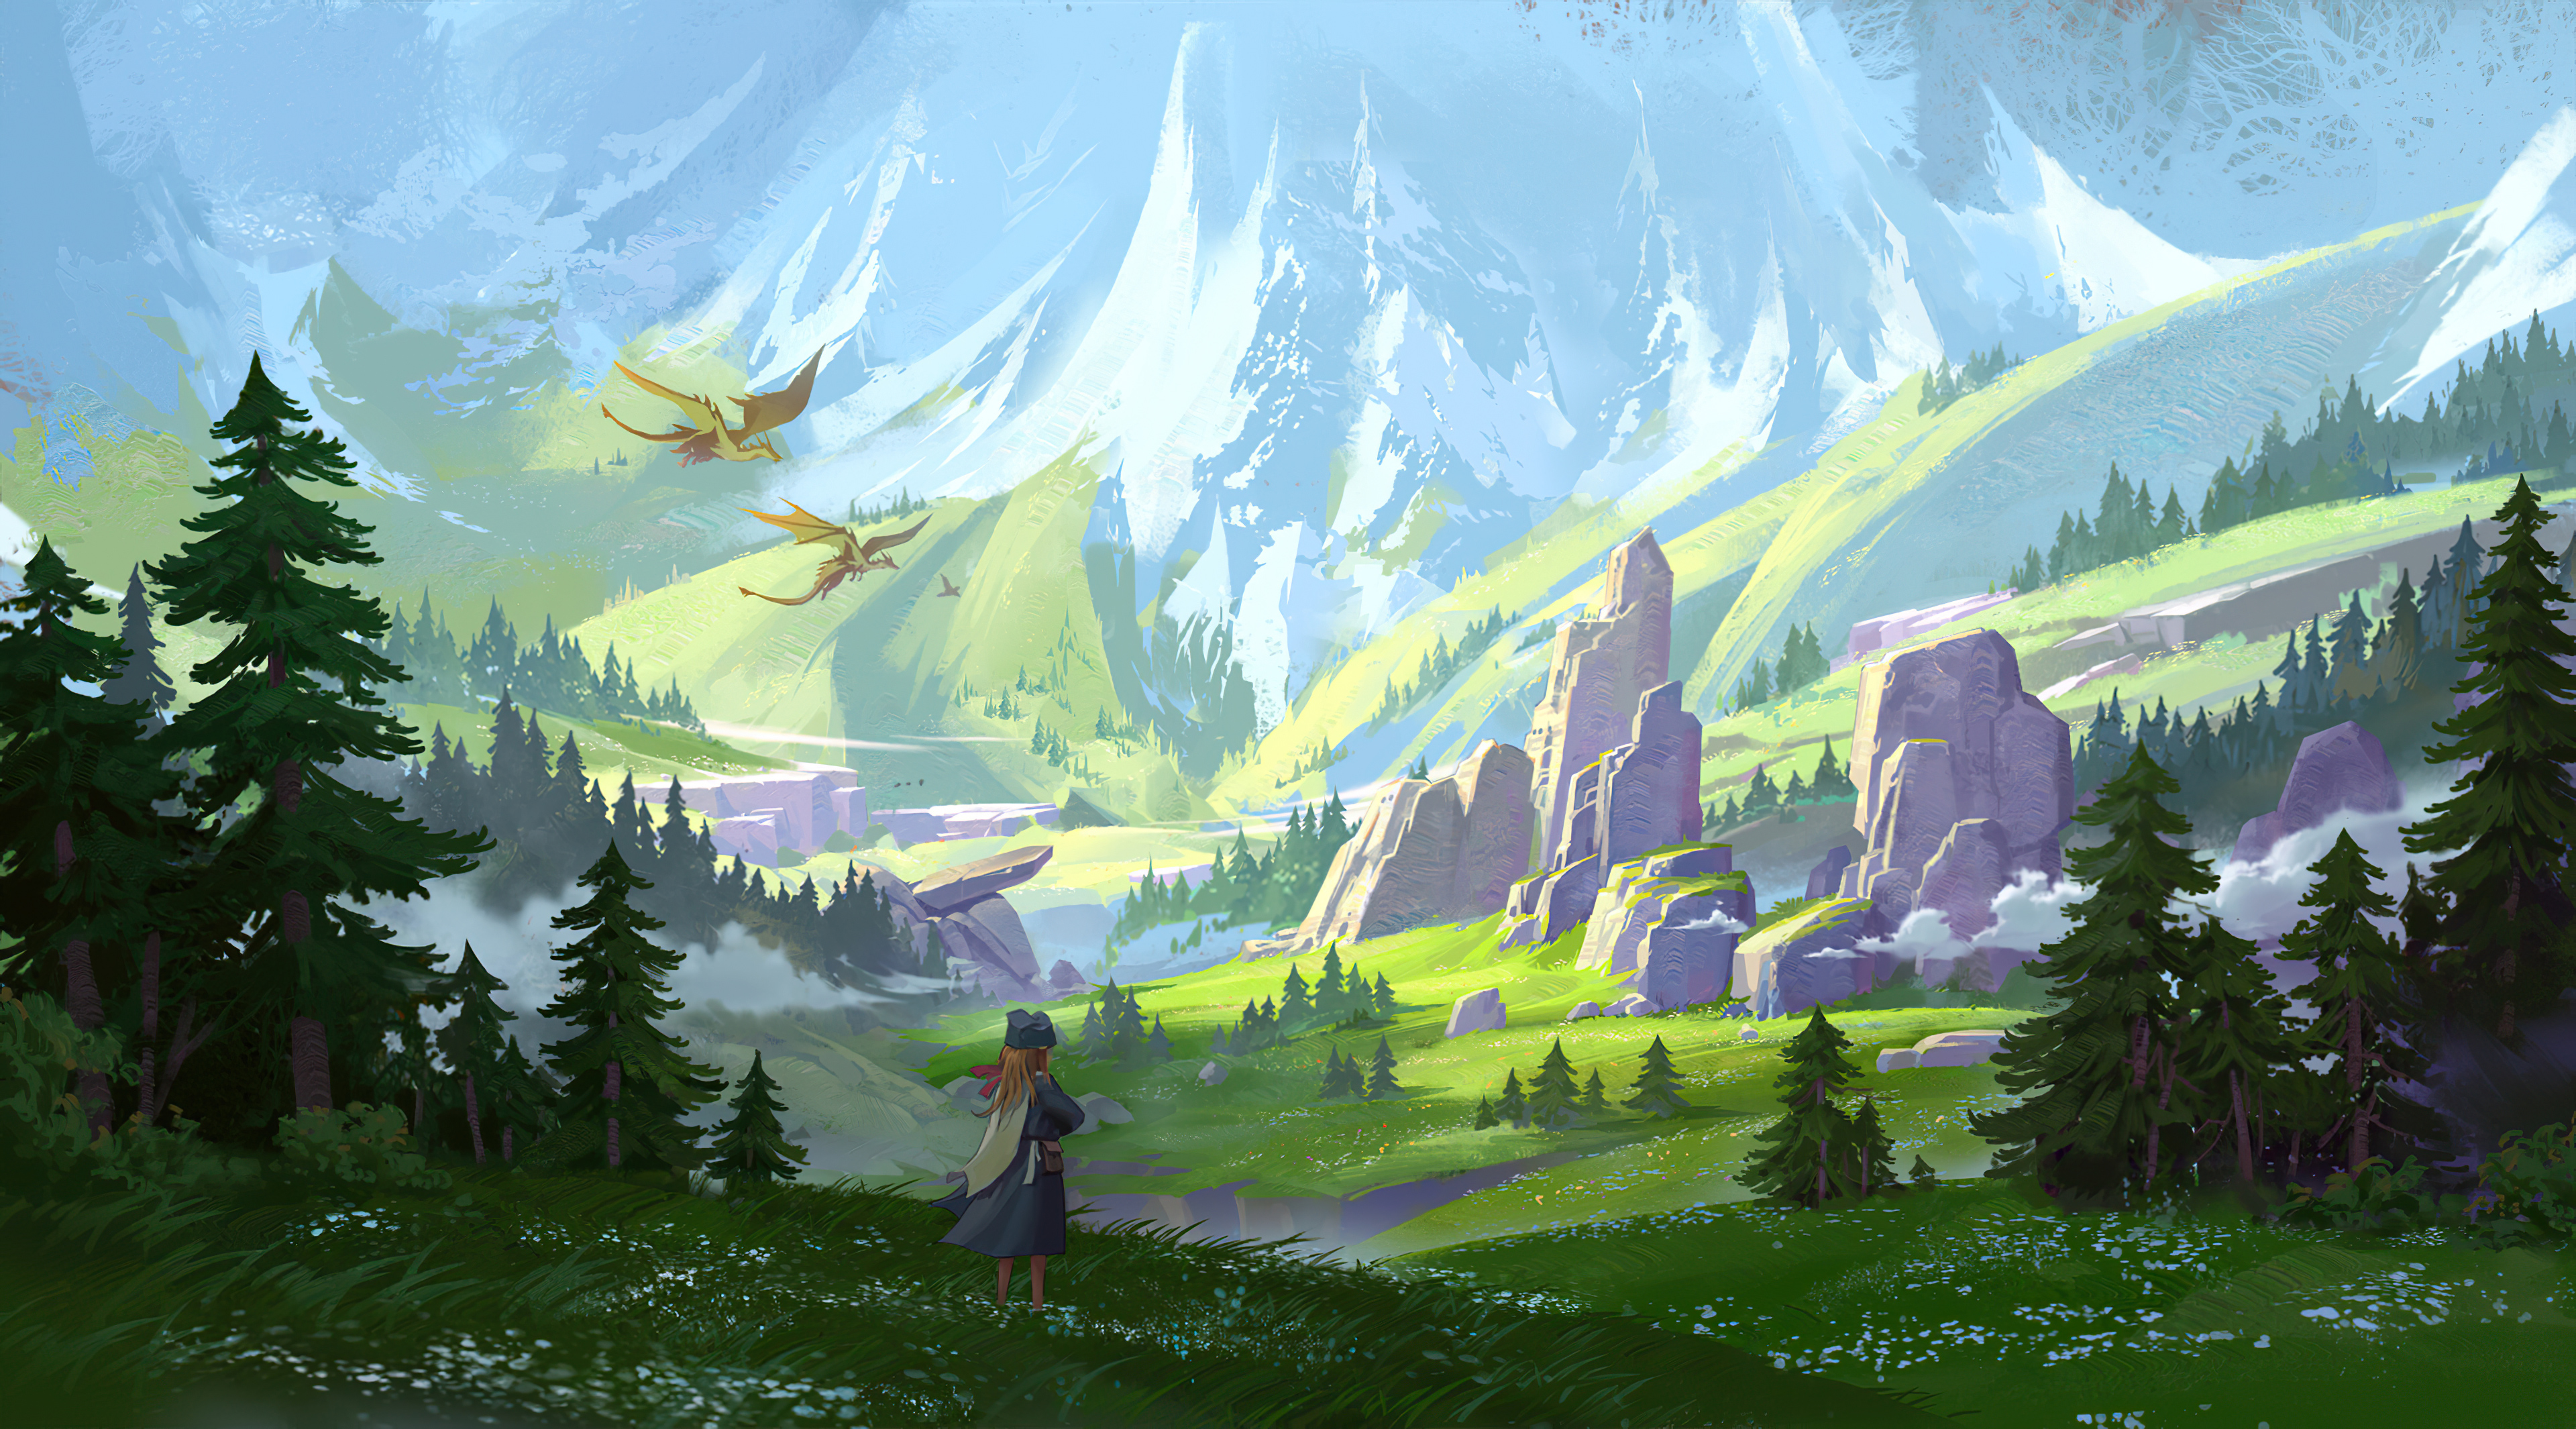 Dragon Girl Mountain 3840x2130